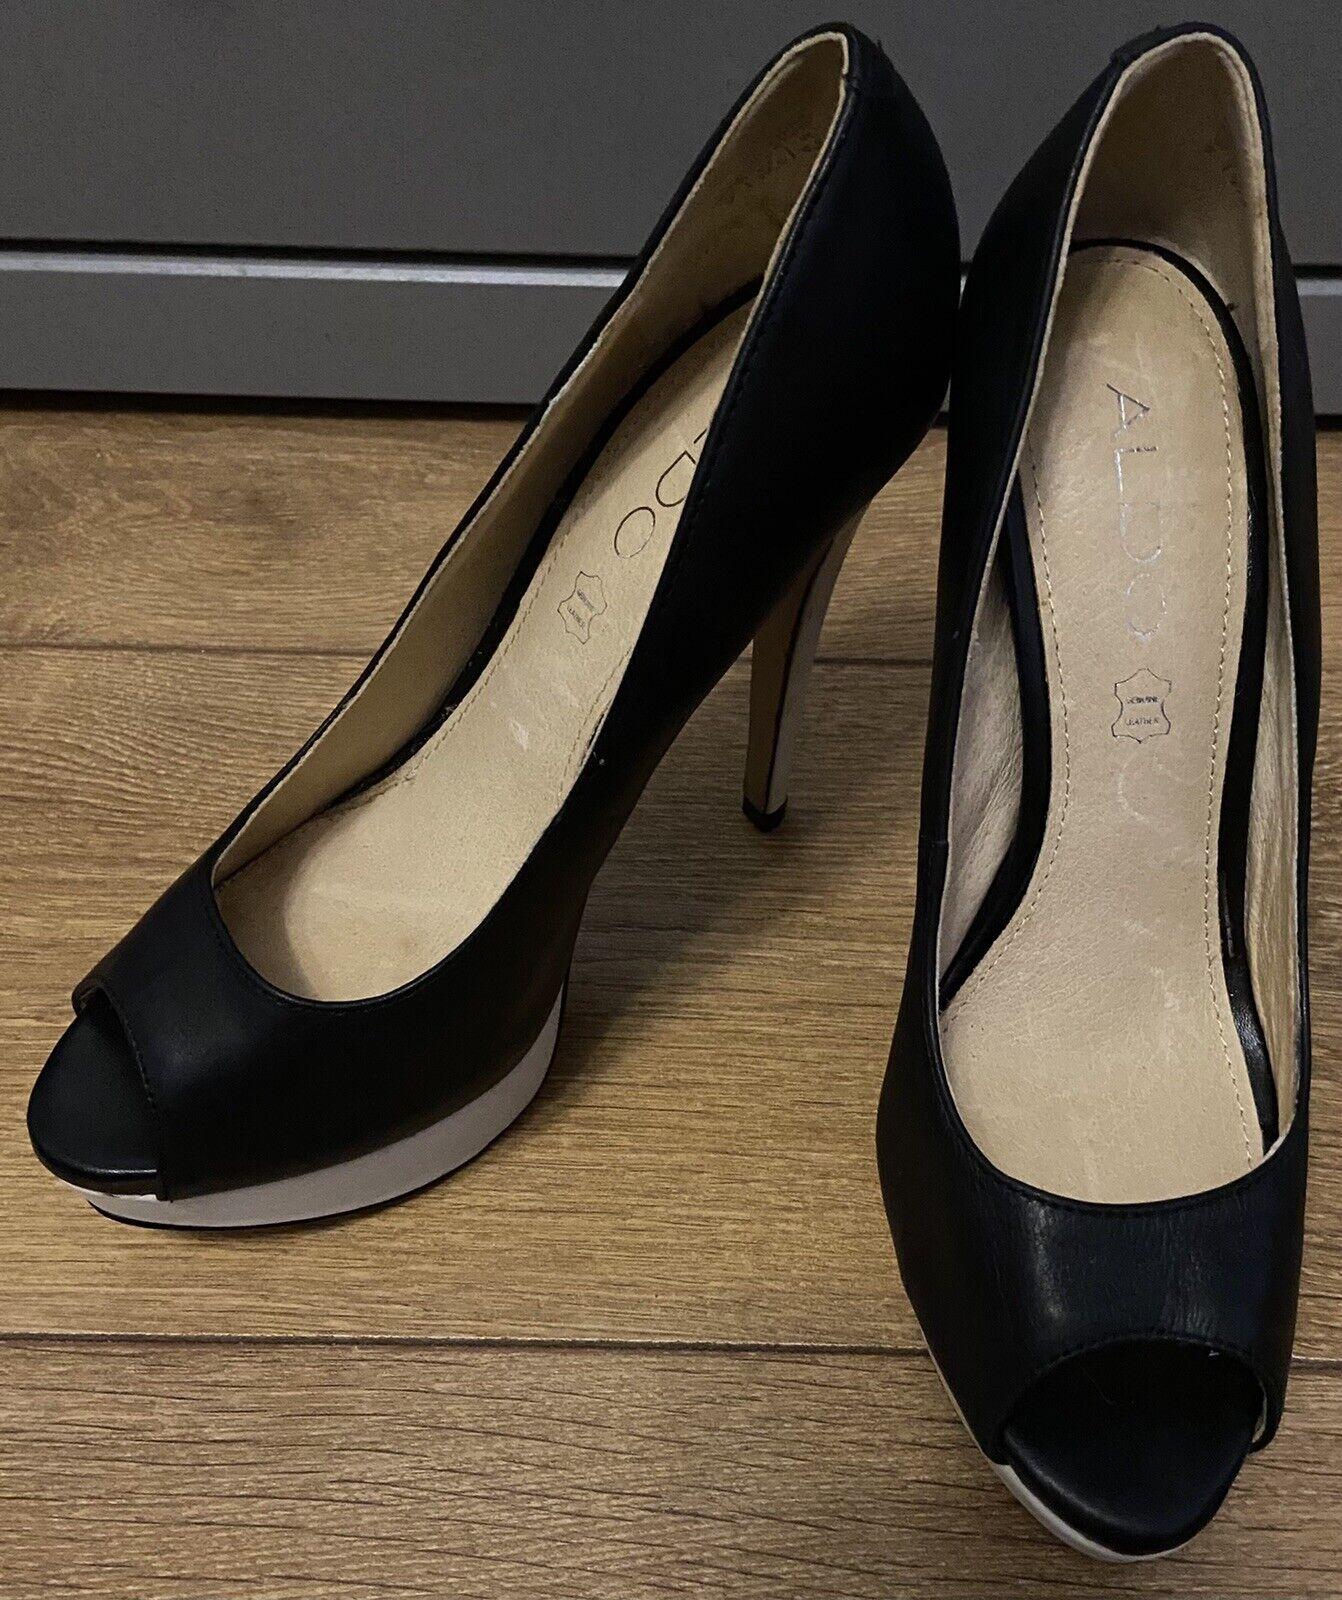 Aldo Black And White Leather Peep Toe Platform Heels Size 4,5